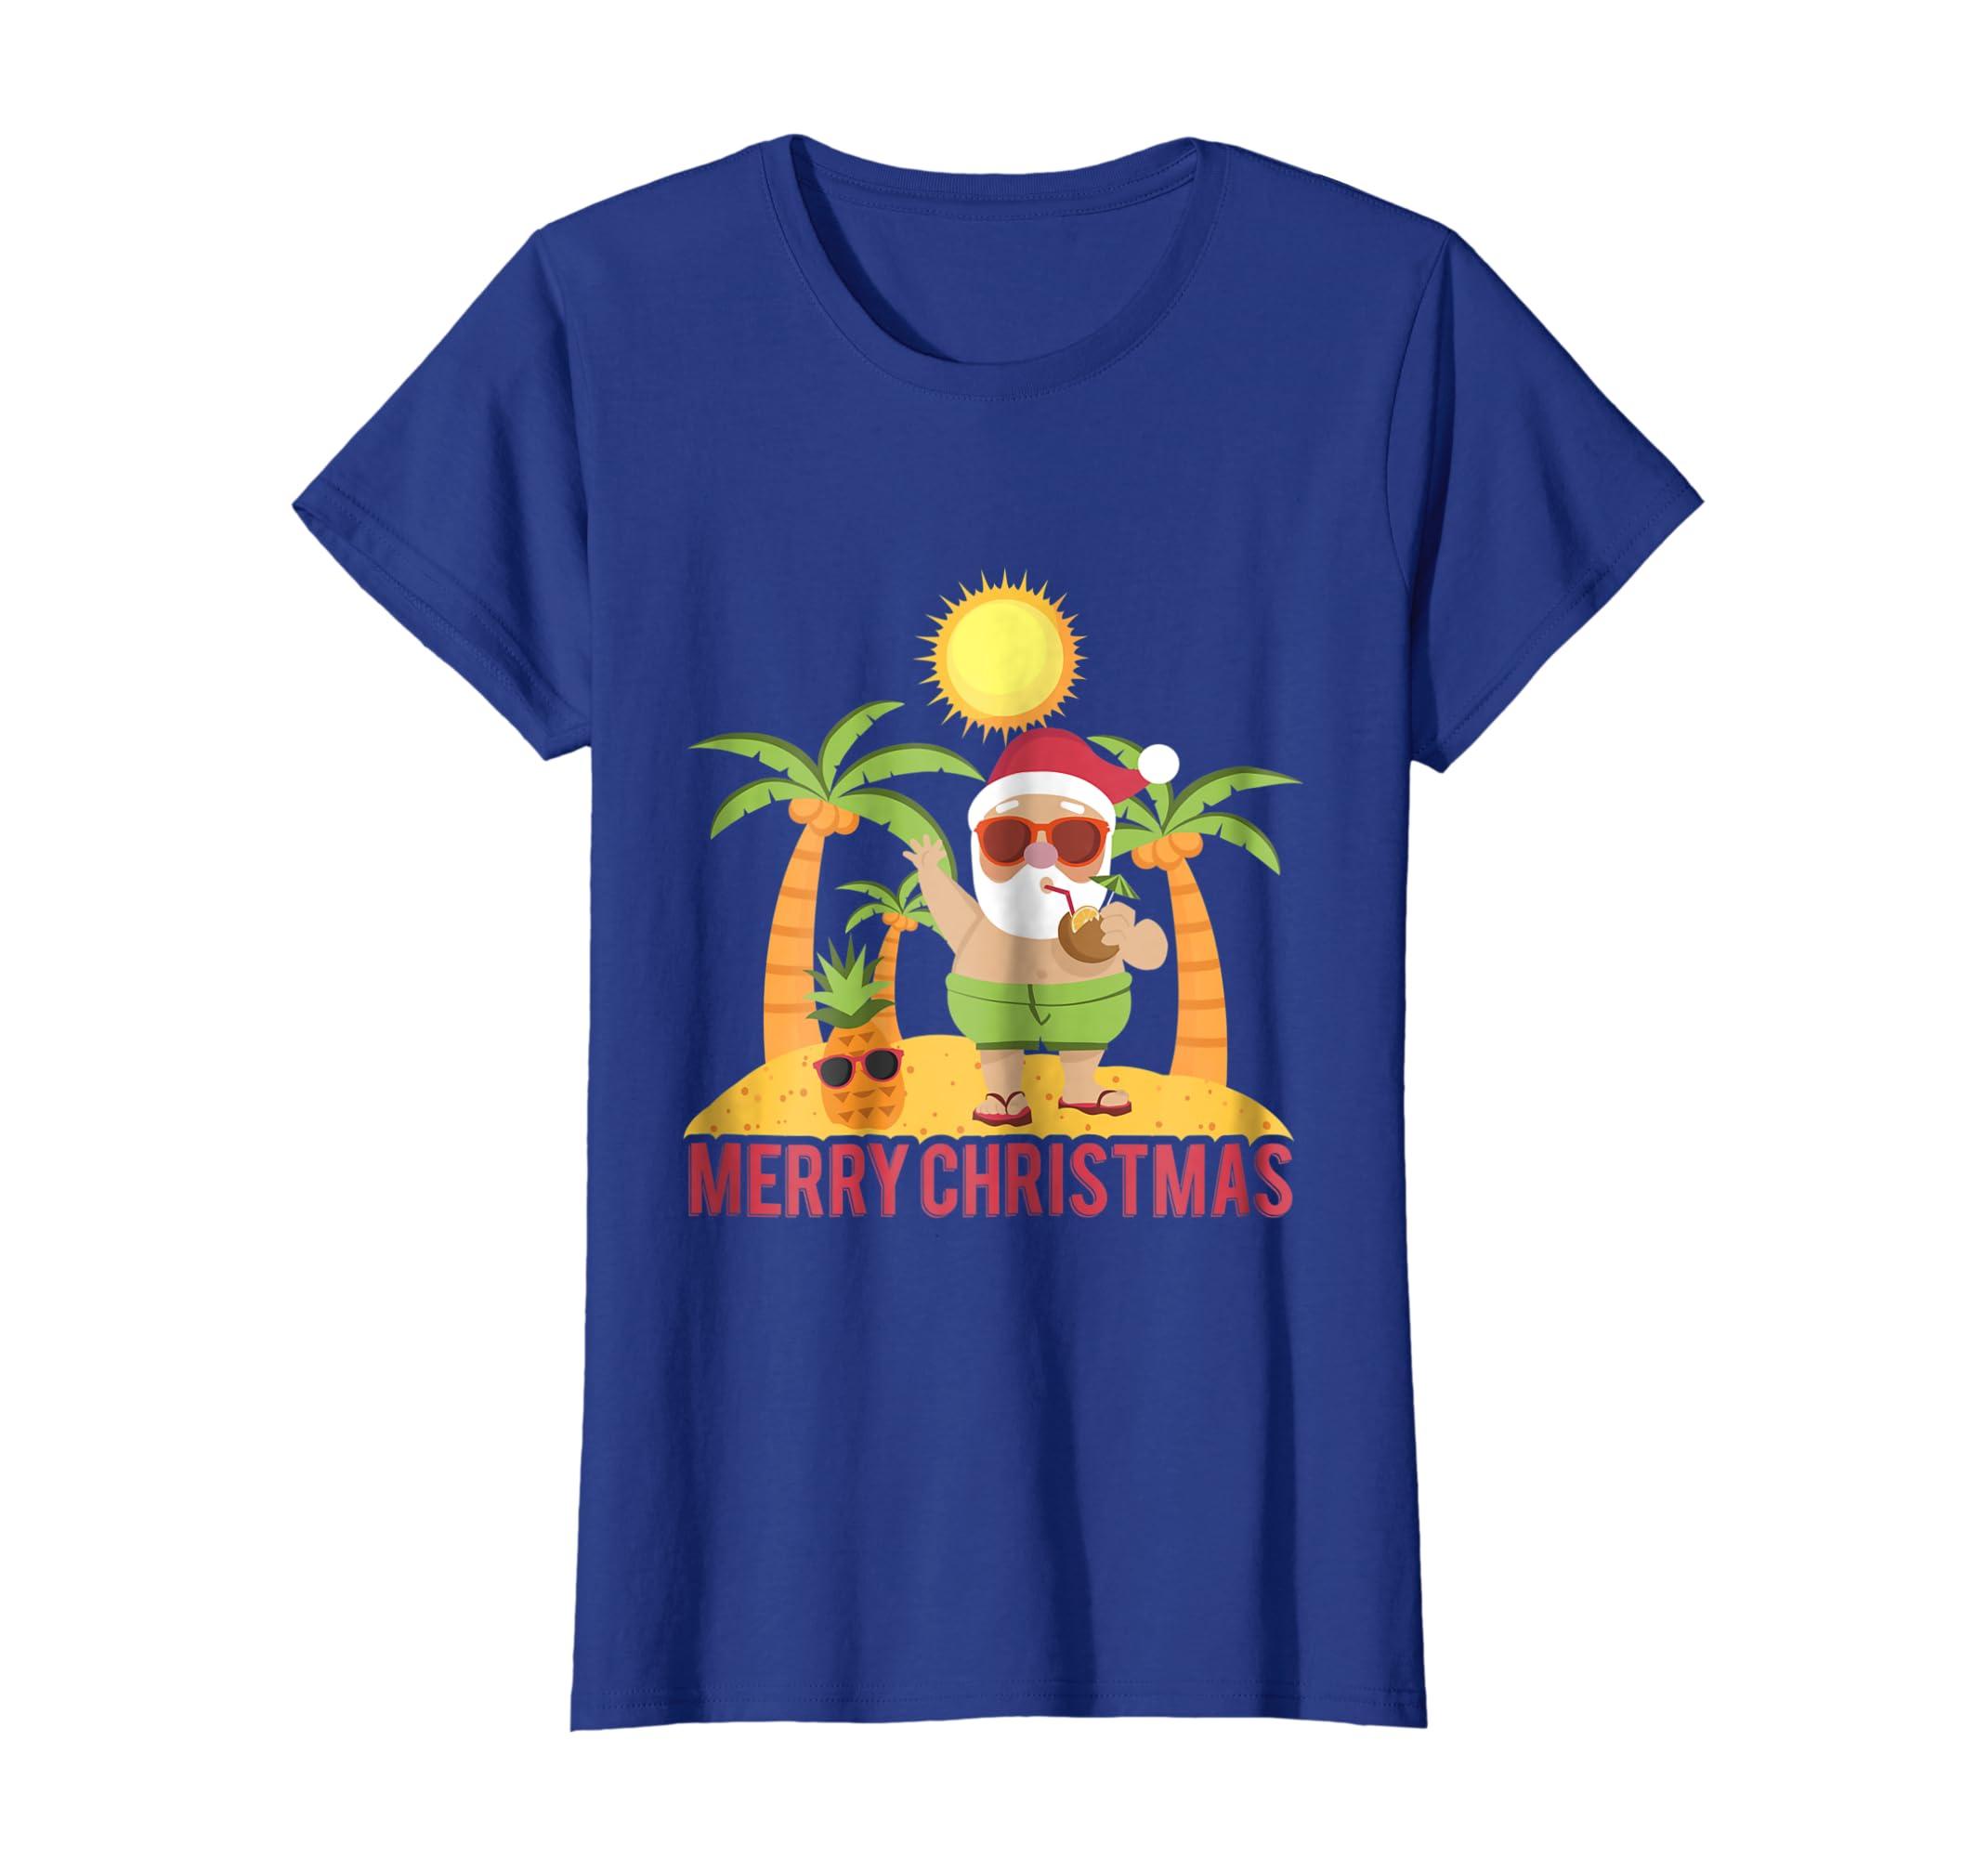 6e2f8fc7bd8d Amazon.com  Funny Santa Claus Summer Shirt Christmas Outfit  Clothing